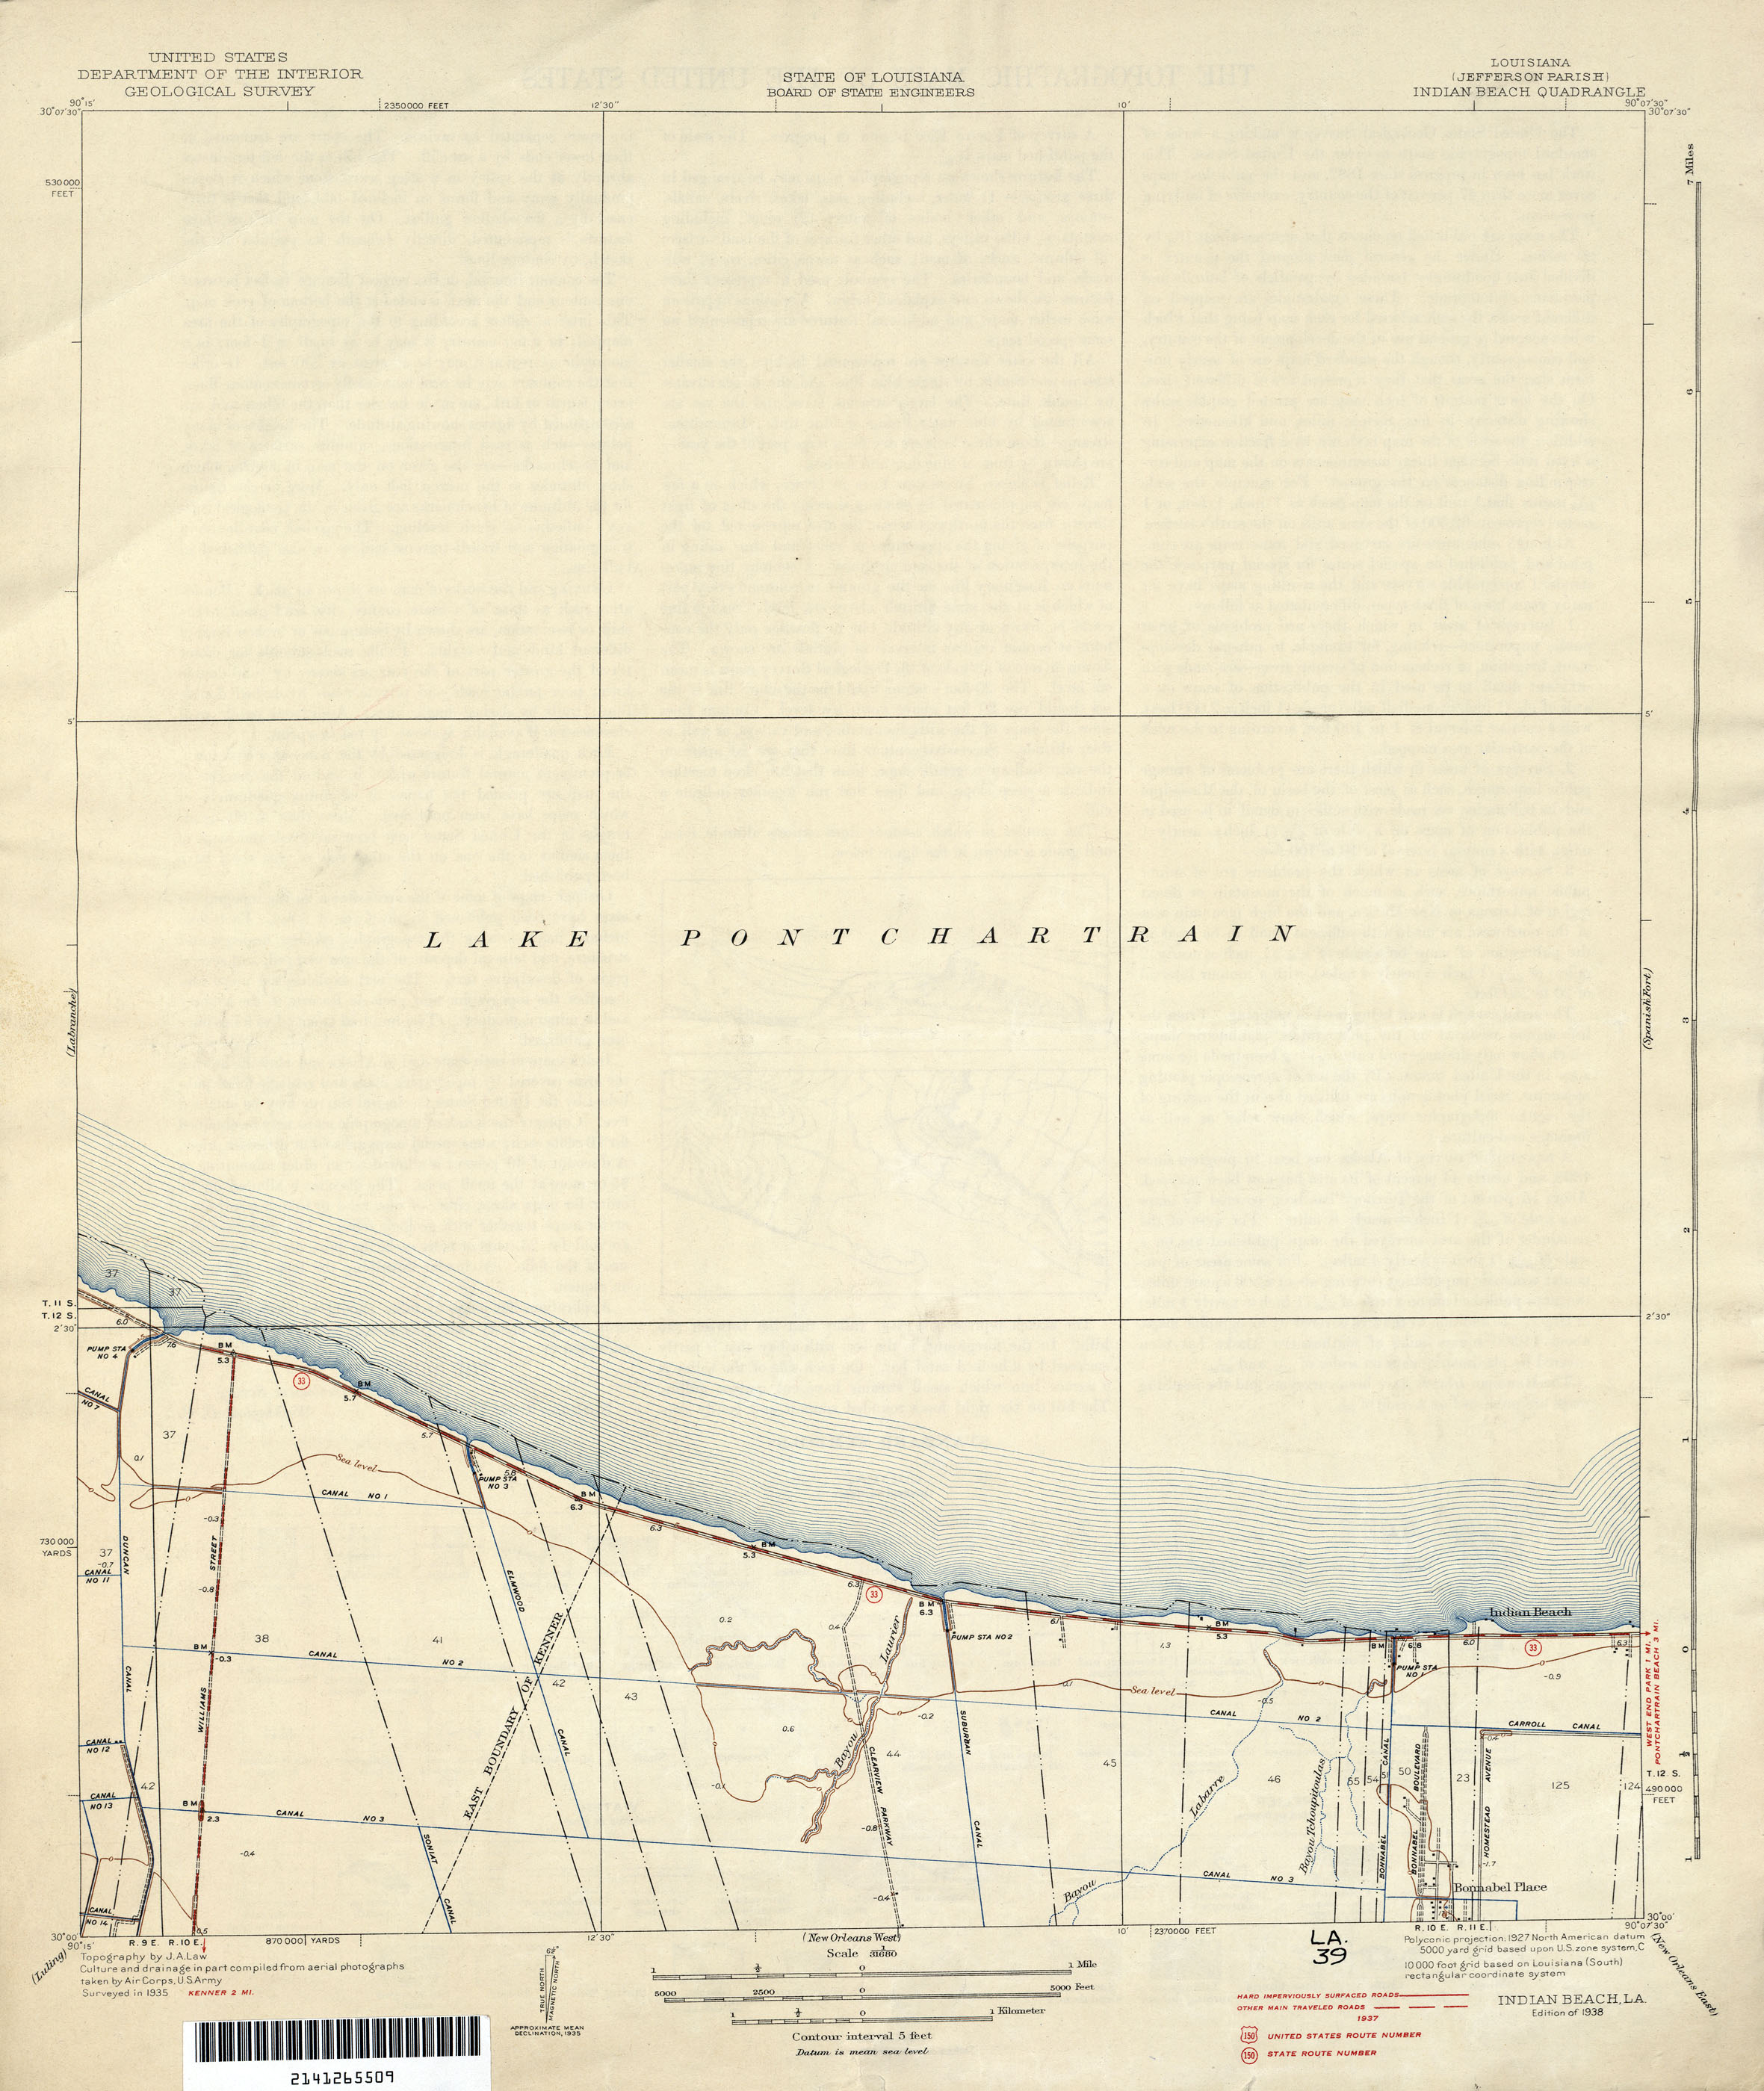 FileJefferson Parish Louisiana Map Lake Pontchartrain Shore Indian